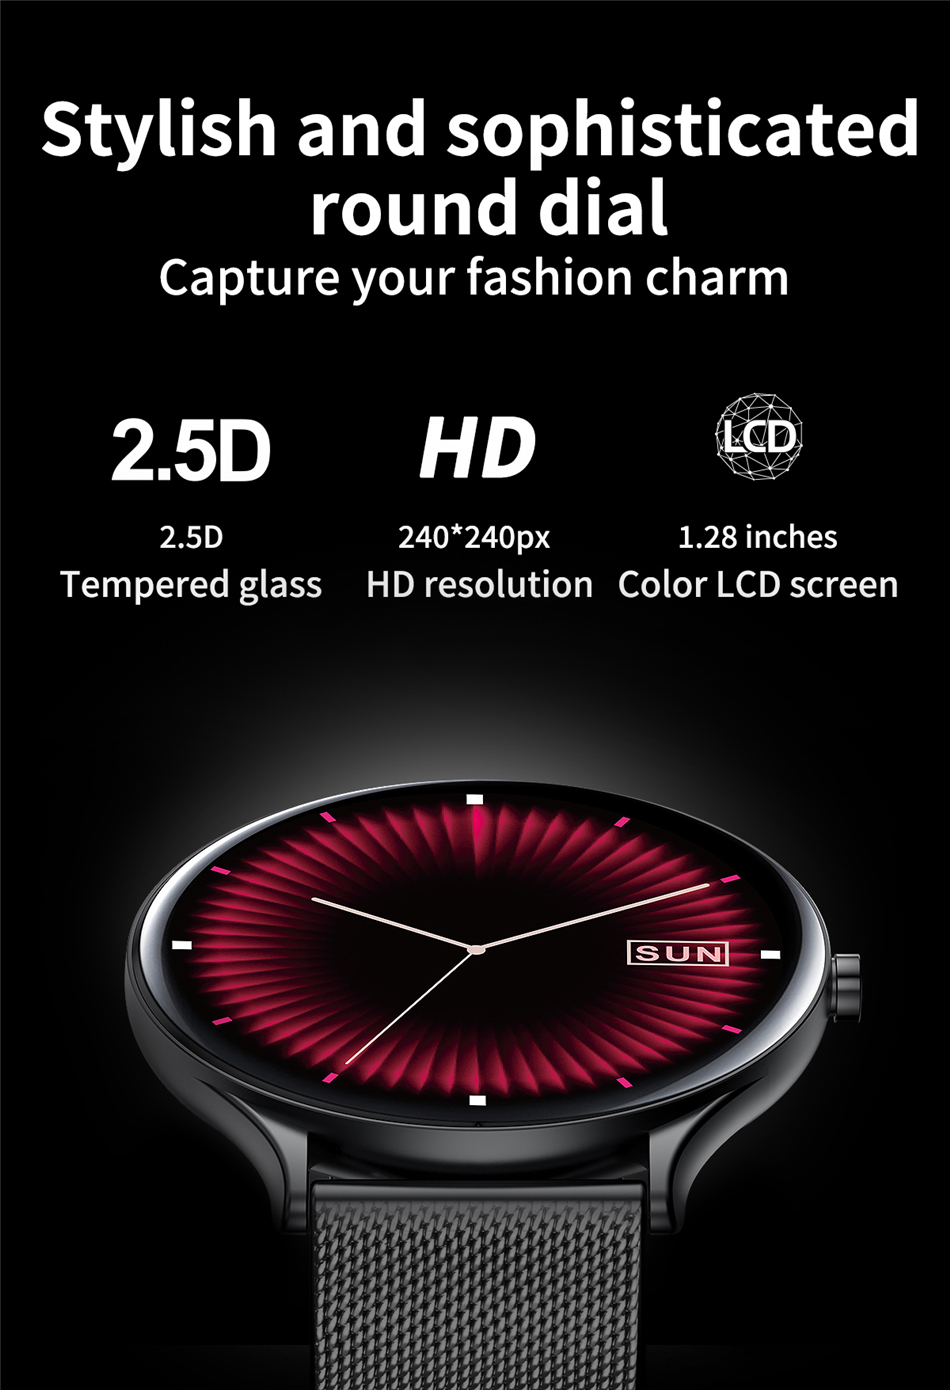 Ha6e23cbc6d424091b044631c5fafe796D 2021 New Full circle touch screen Women smart watch Luxury steel Watch Band Fashion smartwatch Sport Activity tracker For Xiaomi